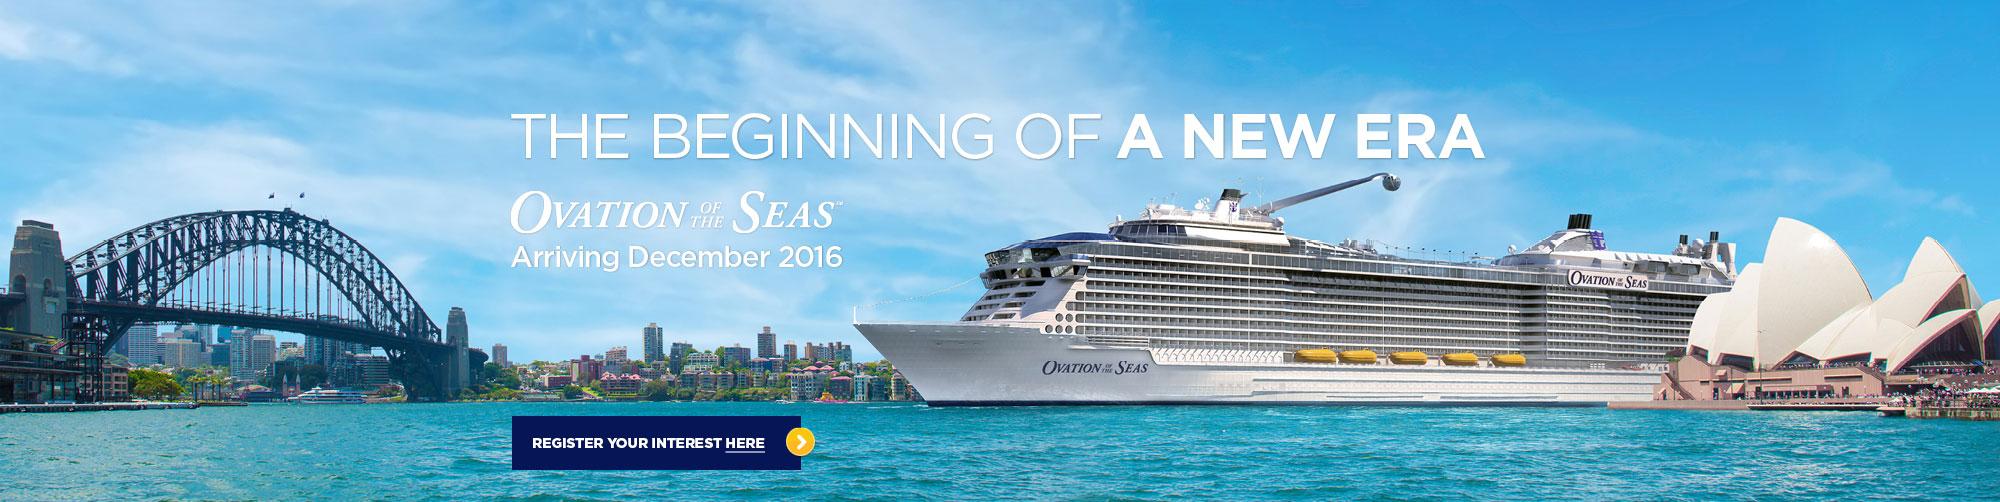 25 Pictures Royal Caribbean Cruise Deals Australia